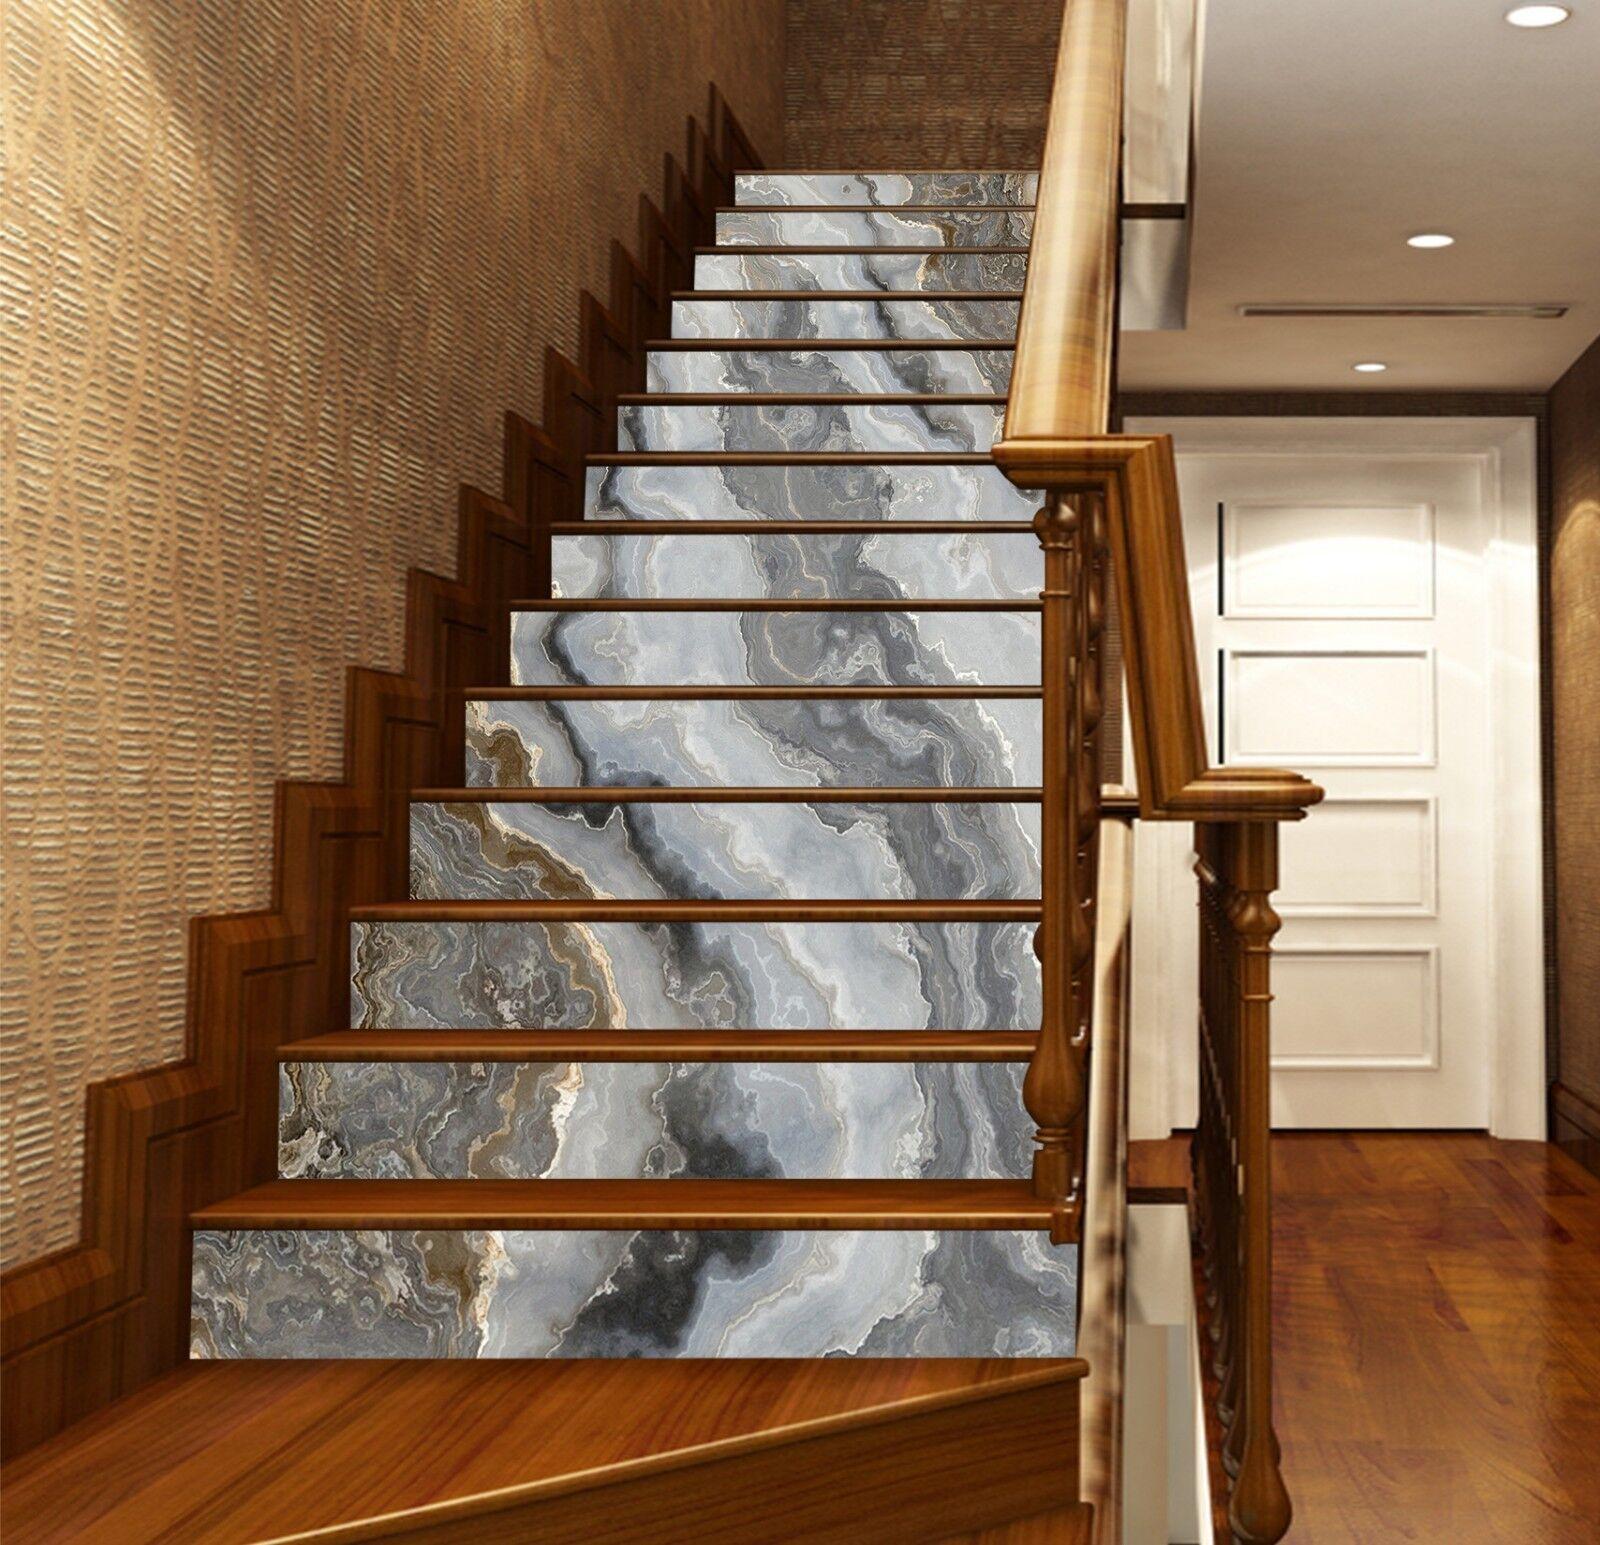 3D Wave Pattern 71 Tile Marble Stair Risers Photo Mural Vinyl Decal WandPapier